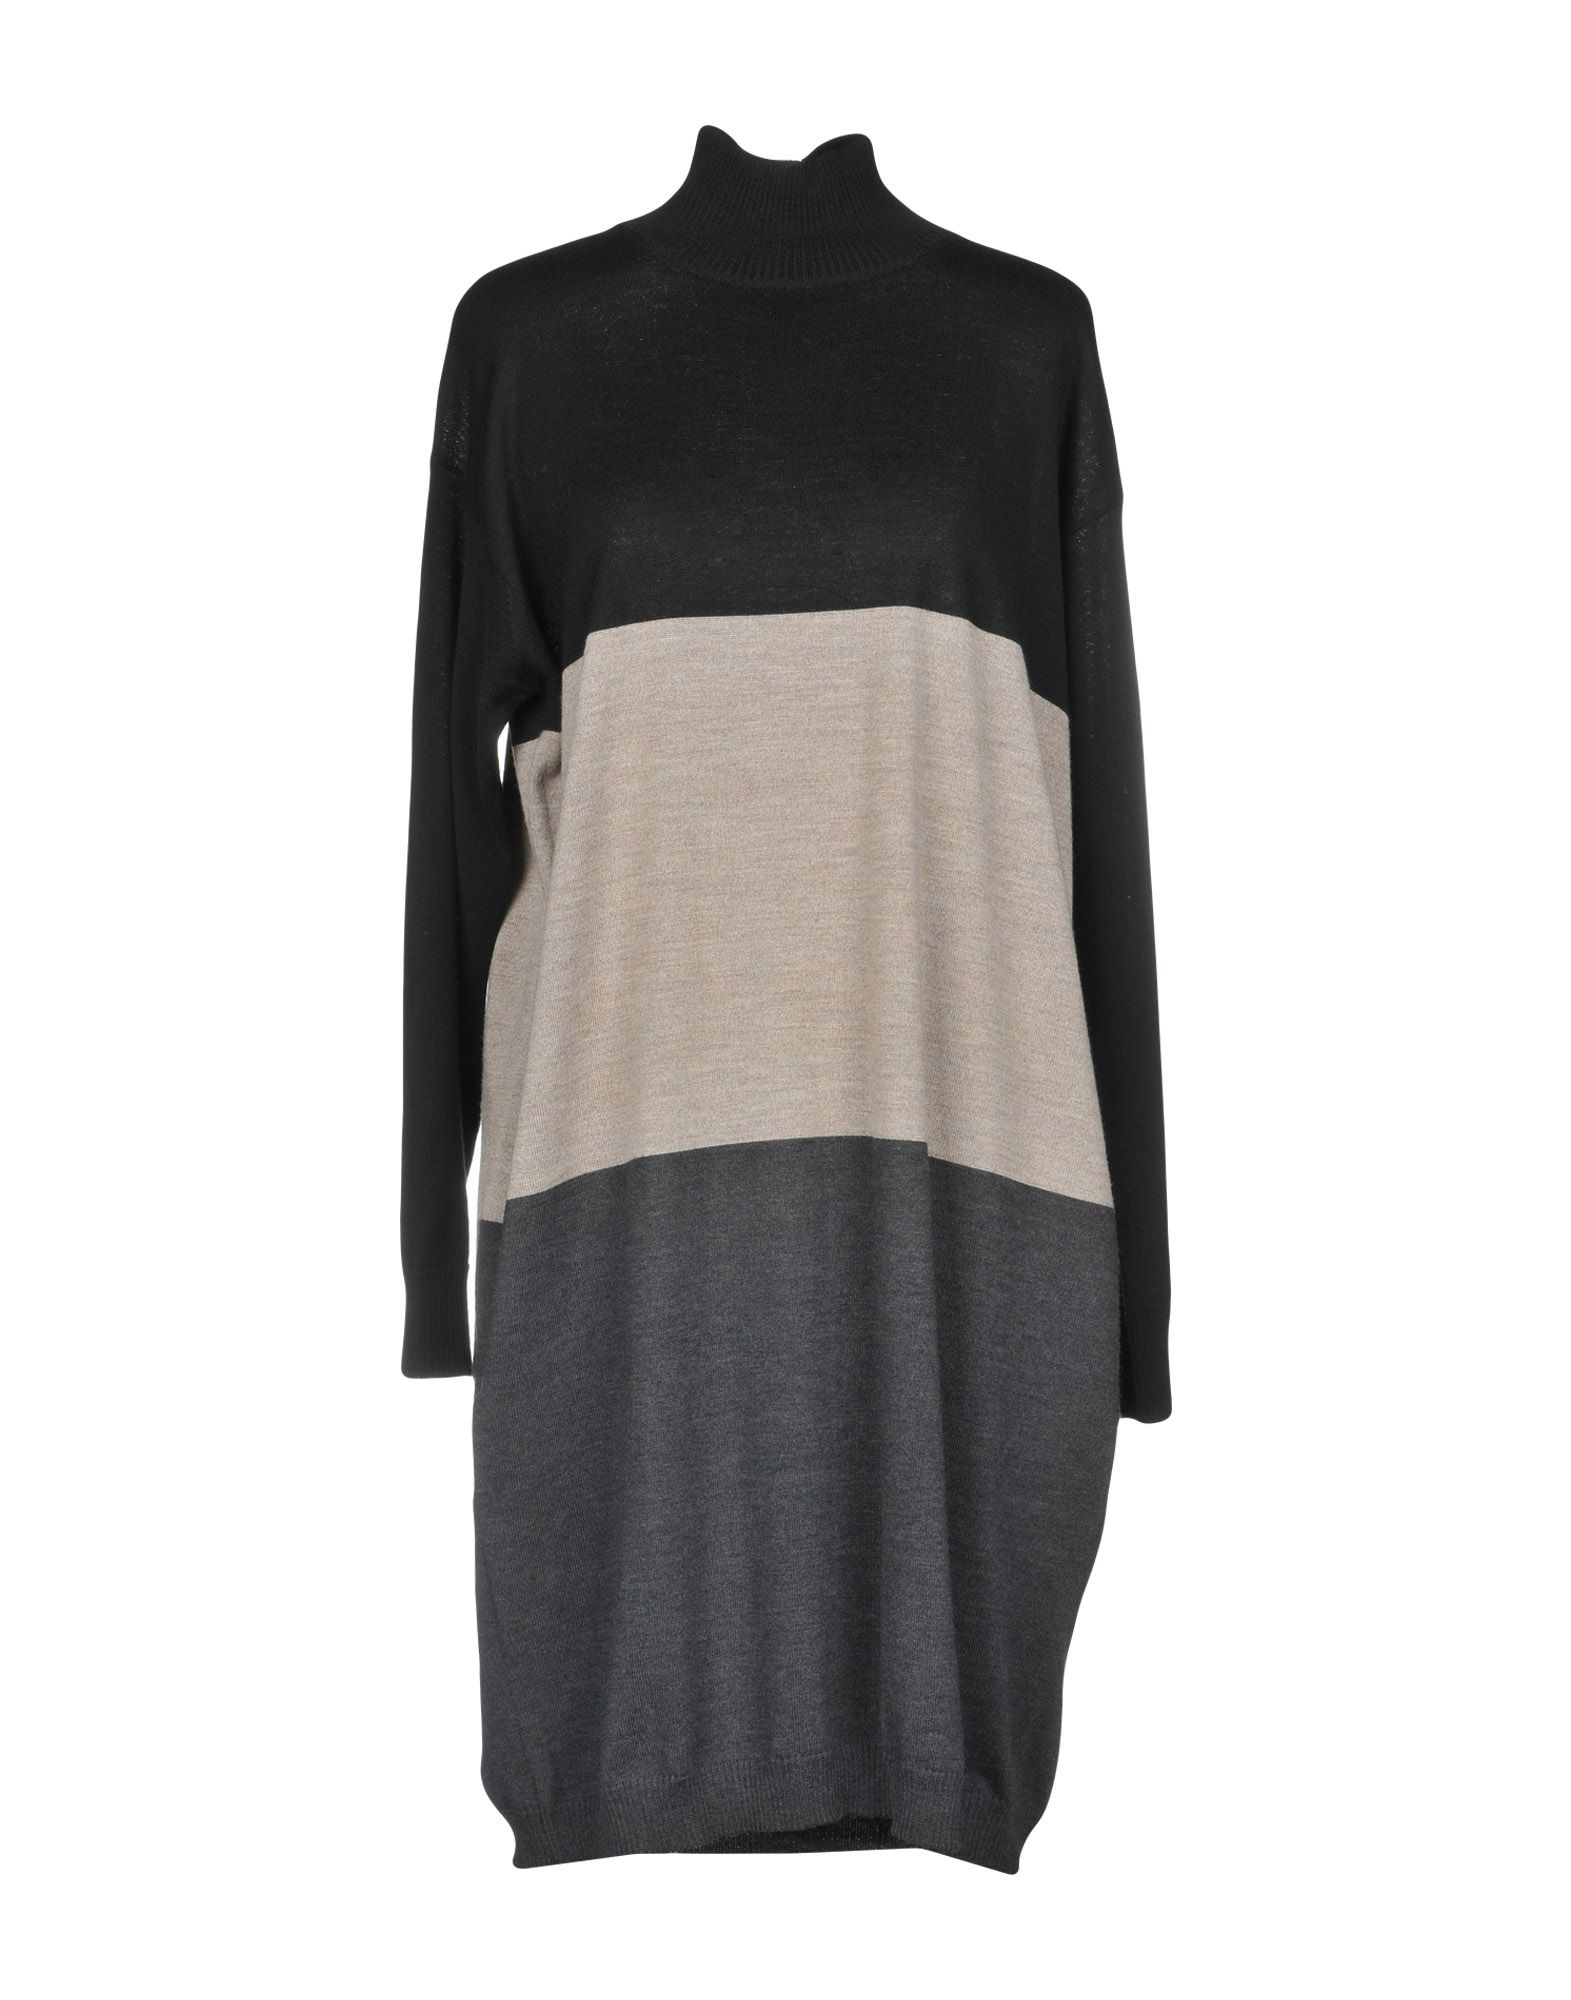 Фото - I'M ISOLA MARRAS Короткое платье i m isola marras длинное платье